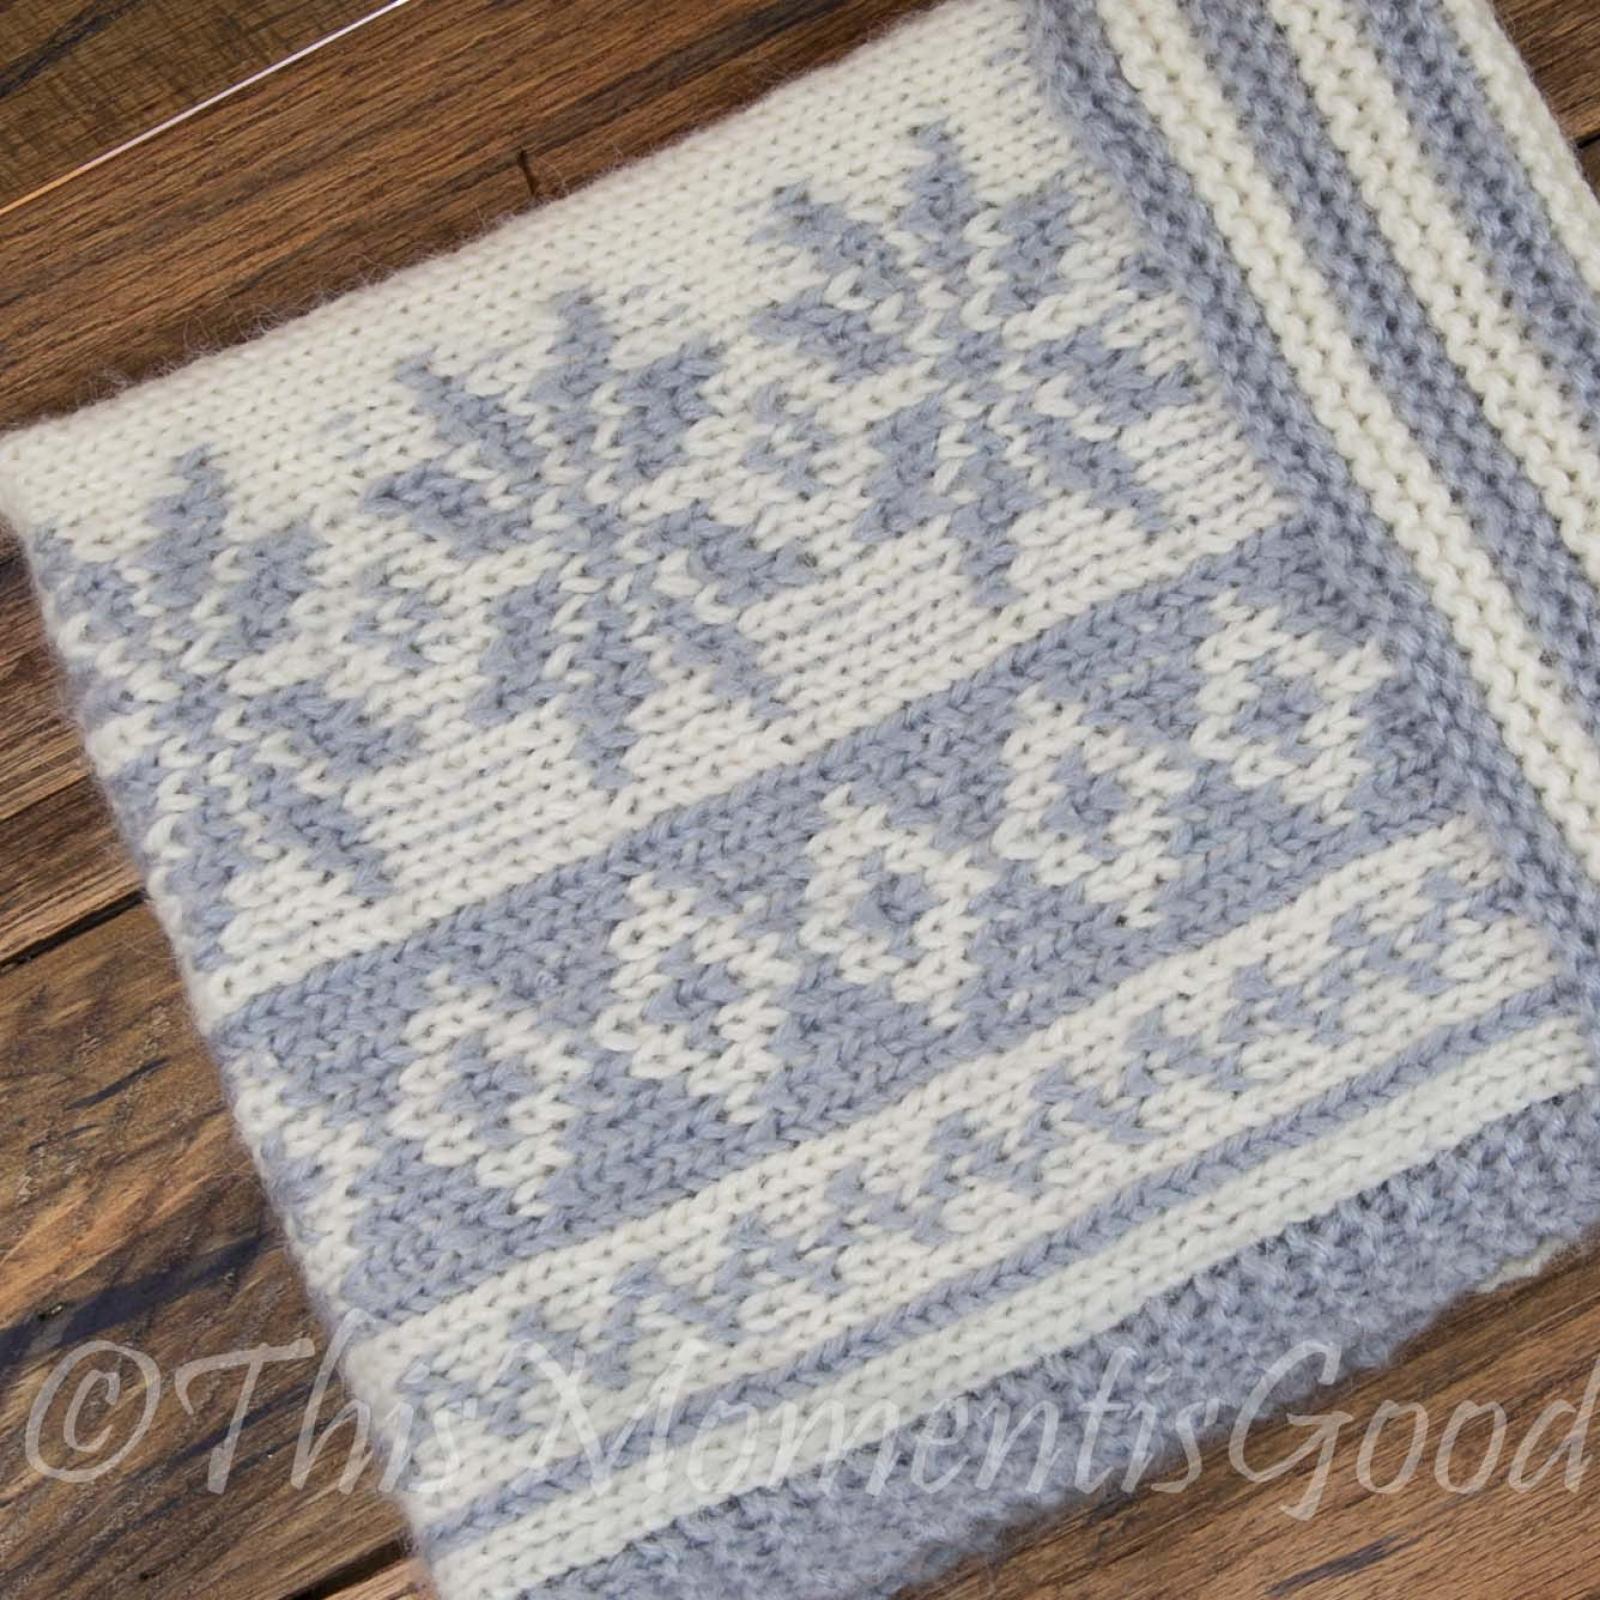 Fair Isle Knitting Patterns : Loom knit fair isle cowl pattern snowflake